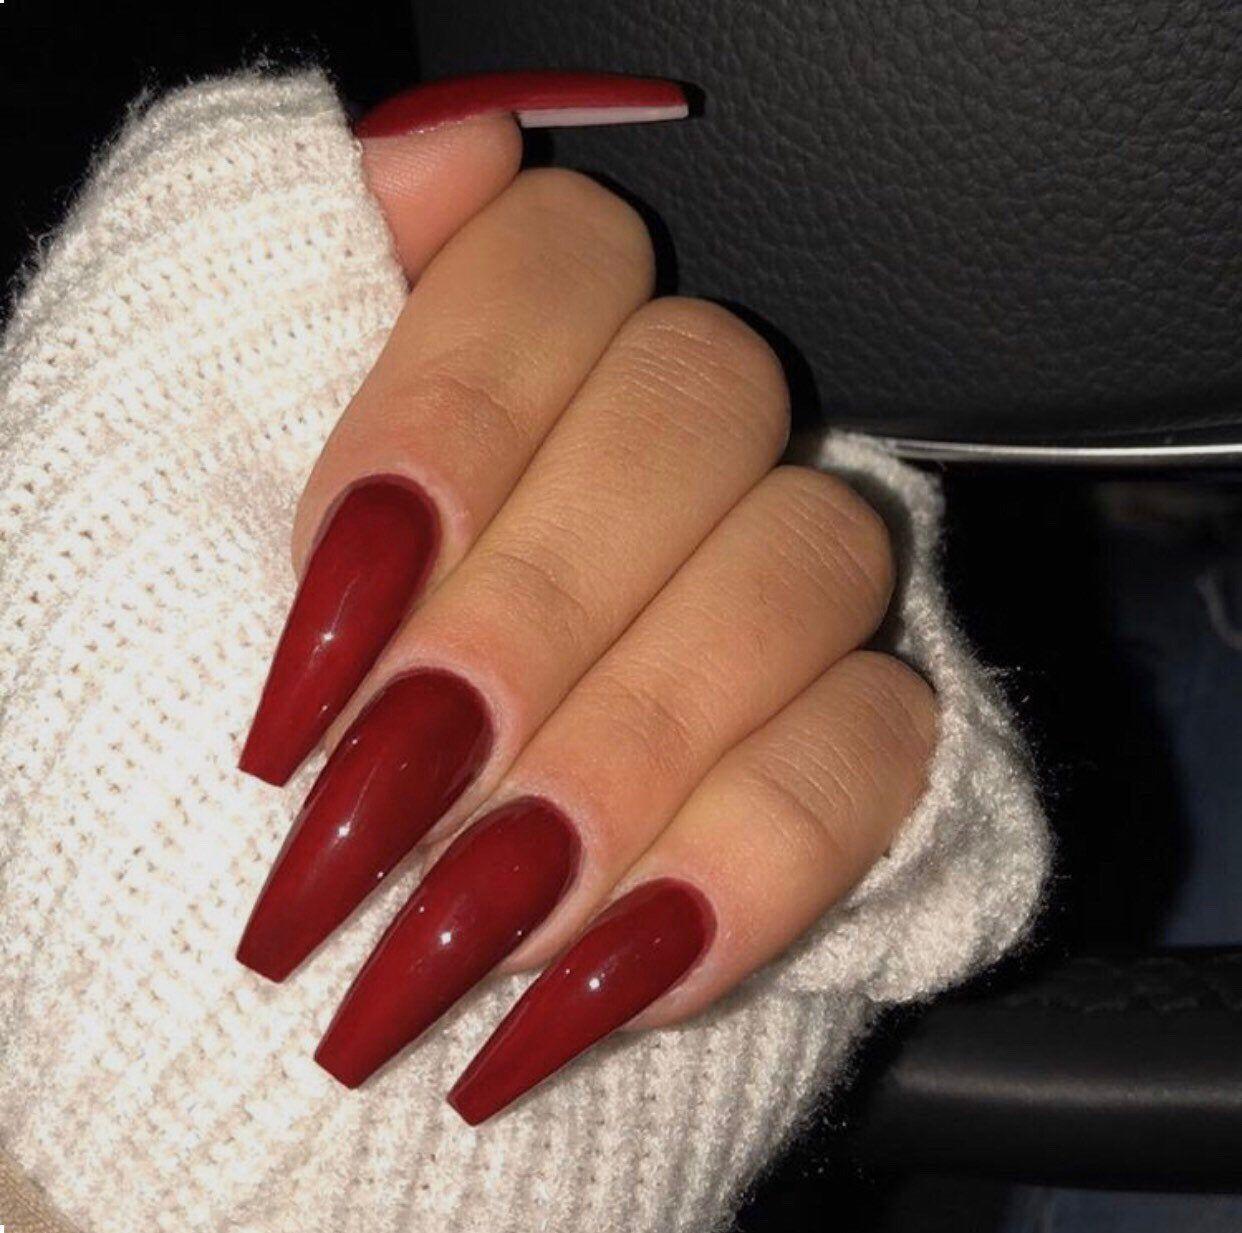 Medium Length Monroe Red Coffin Ballerina Gel Nails T Ballerina Gel Nails Red Gel Nails Red Nails